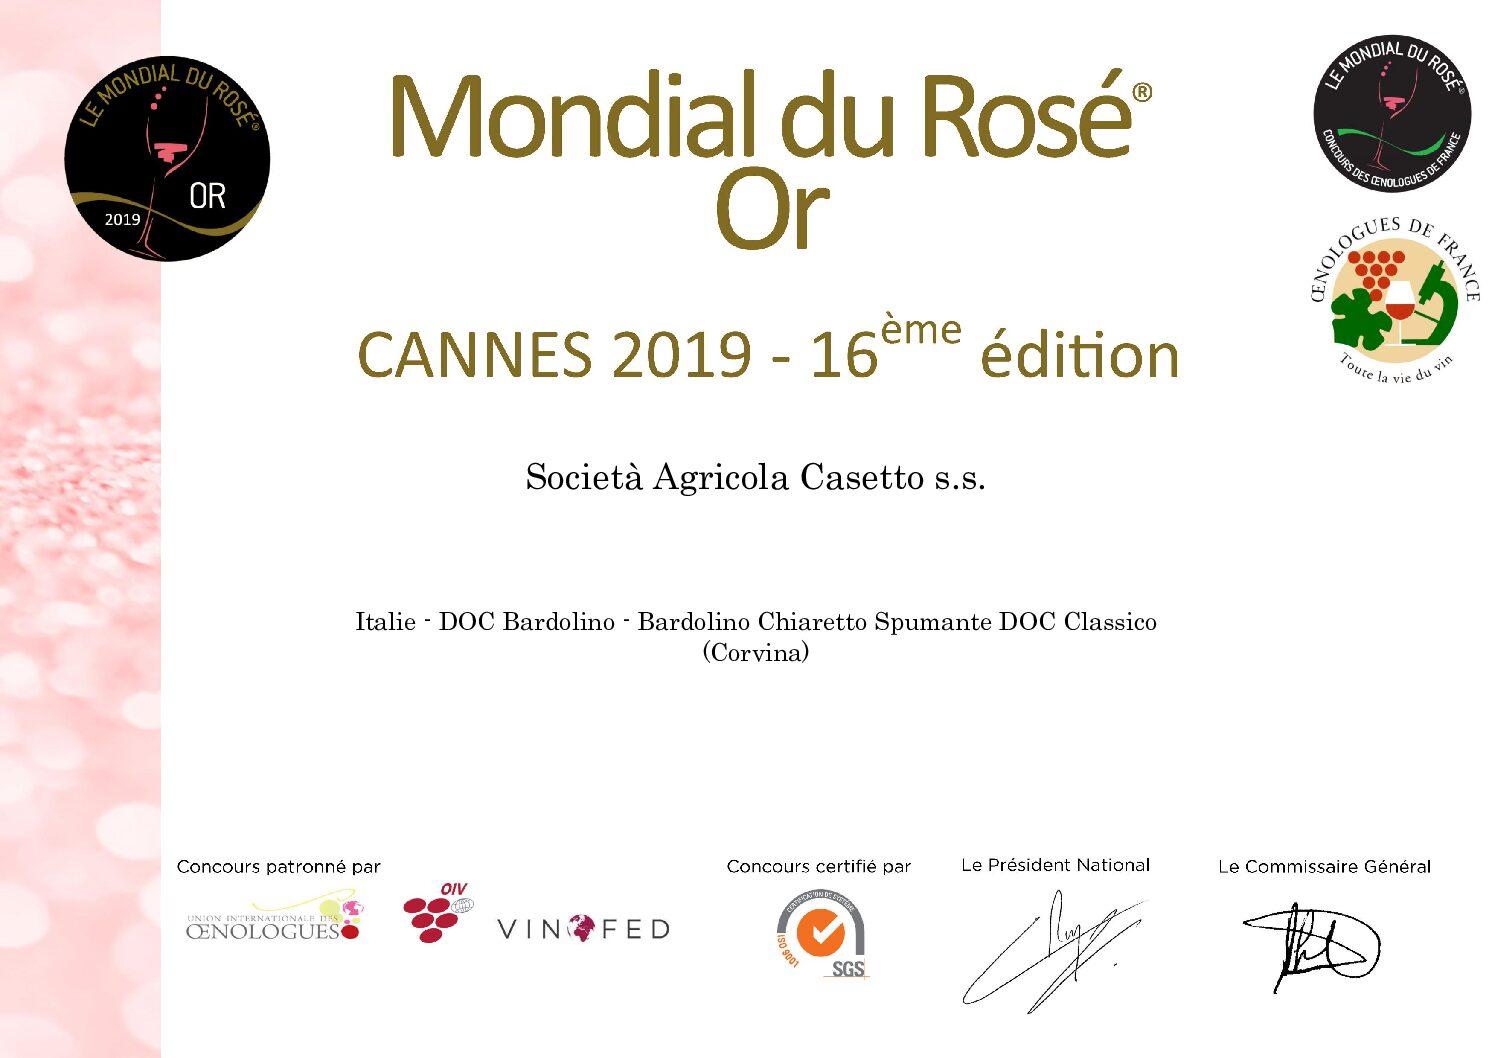 Diploma-Mondial-du-Rosé-2019